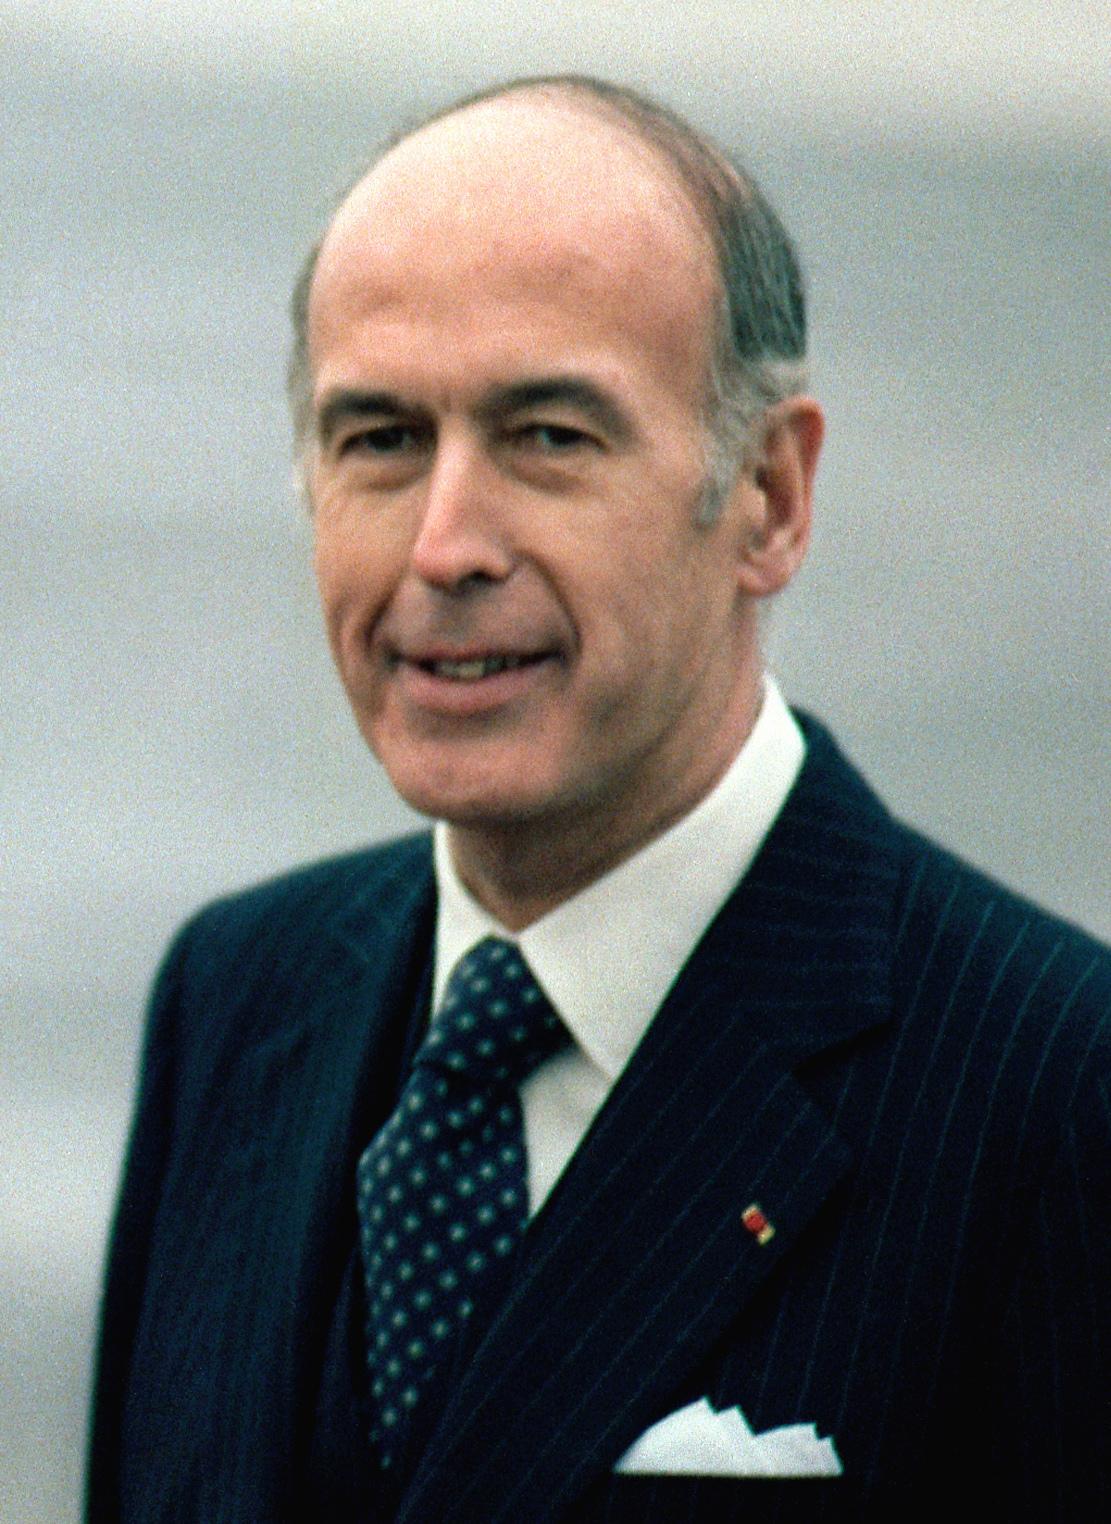 Image:Valéry Giscard d'Estaing 1978.jpg